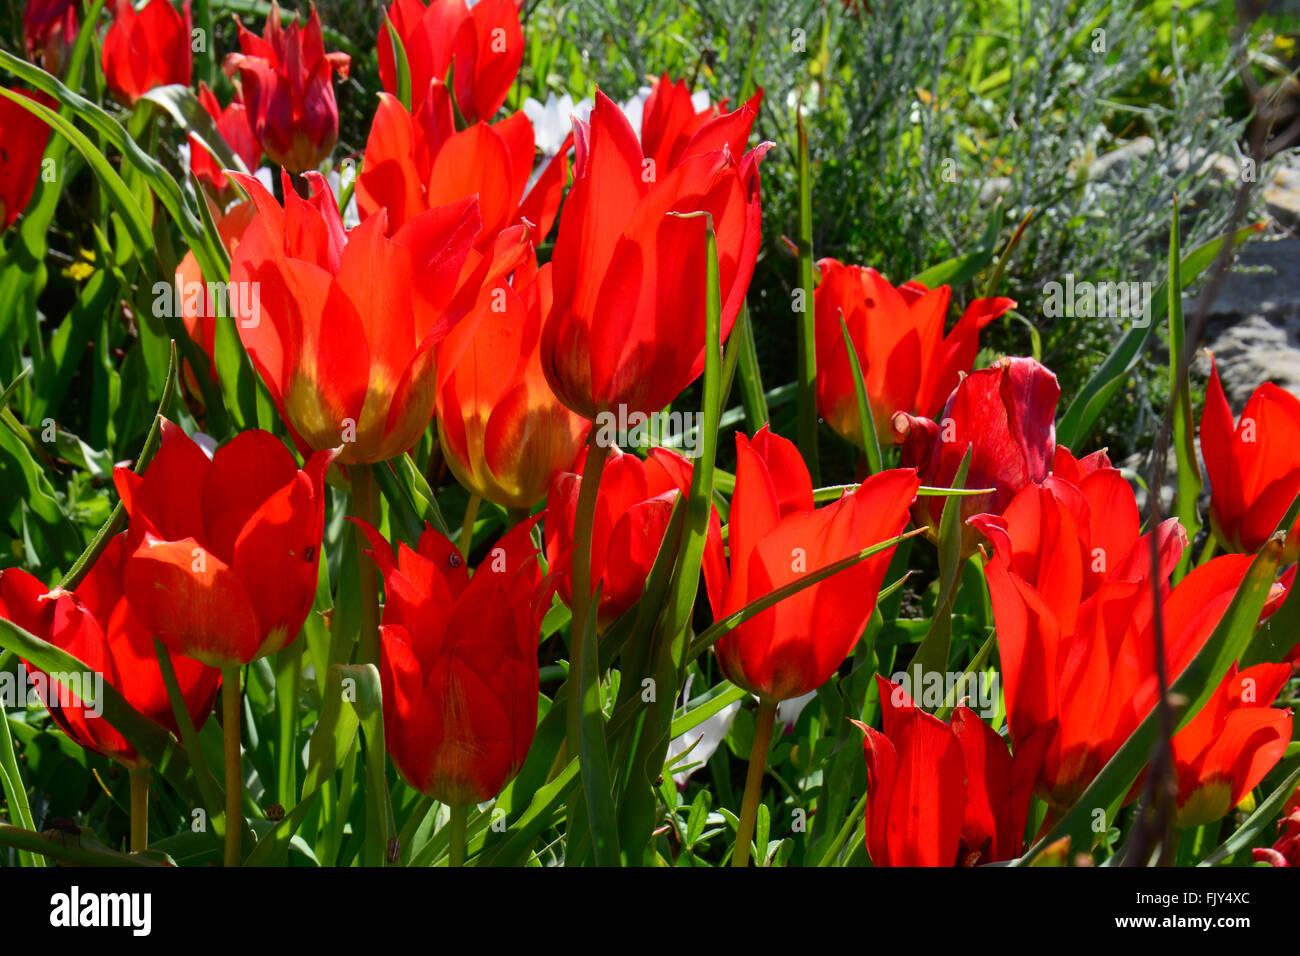 Group of wild tulips,Tulipa agenensis - Stock Image